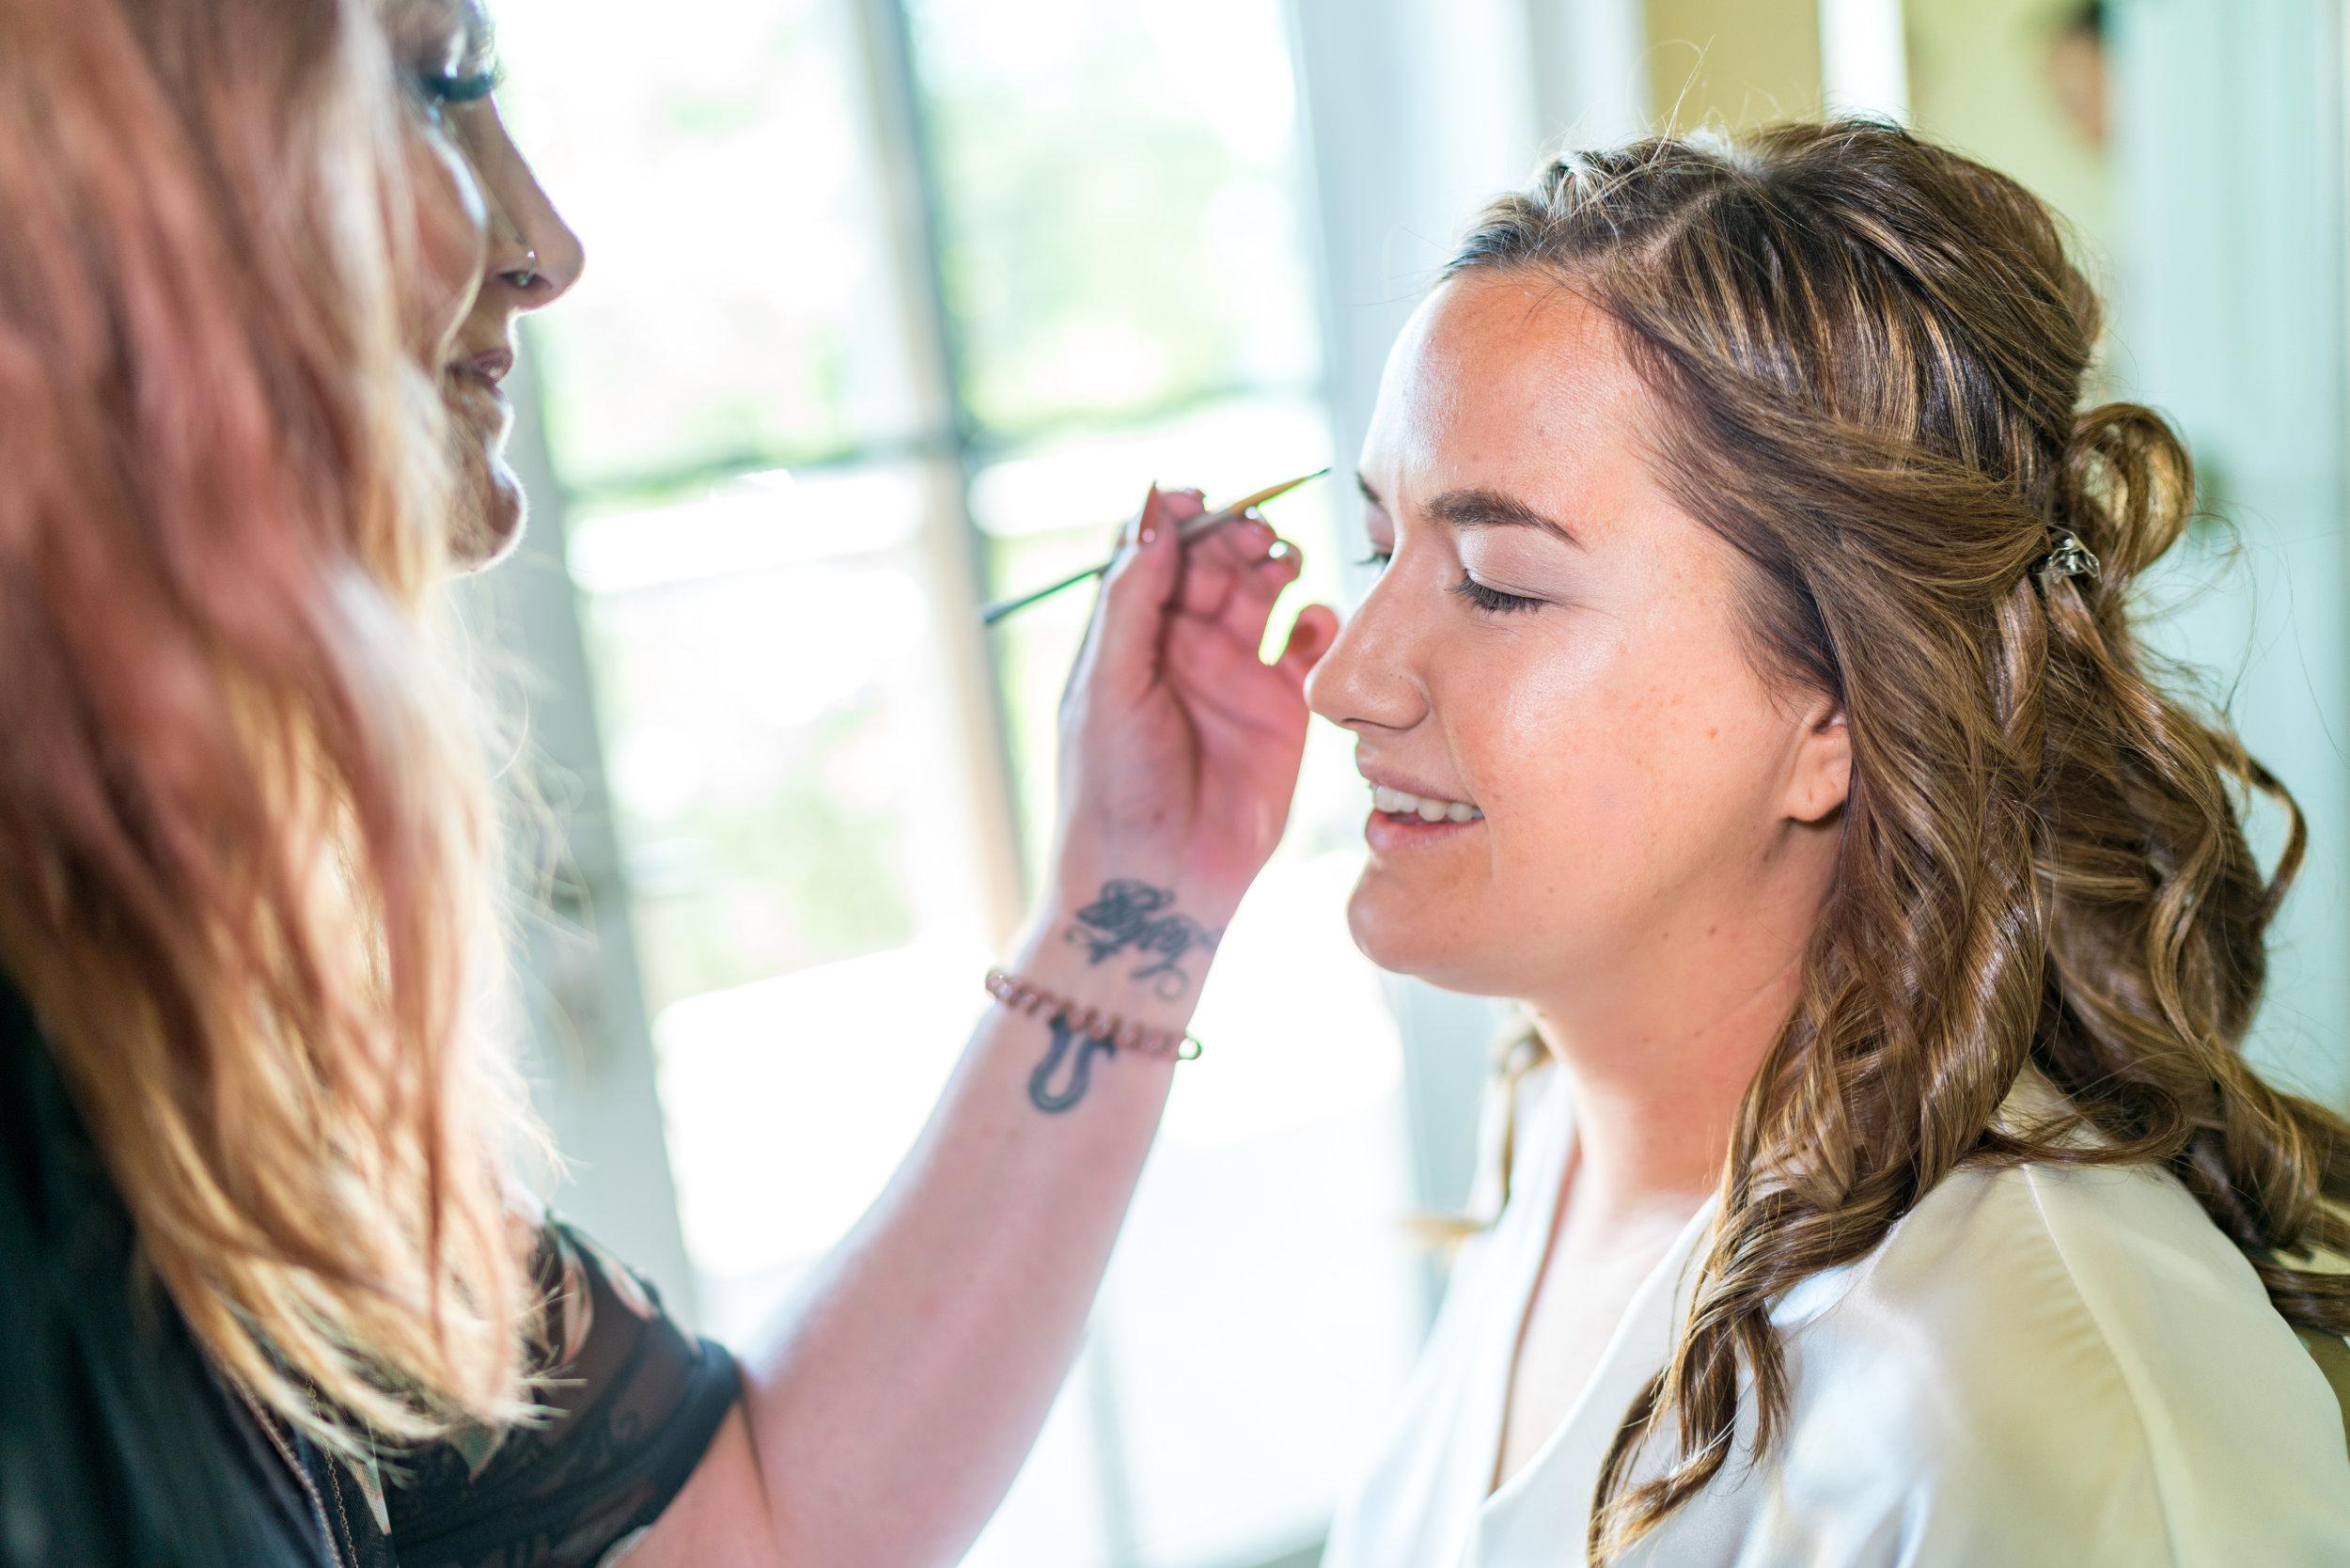 bride-makeup-details-wedding-photographer.jpg